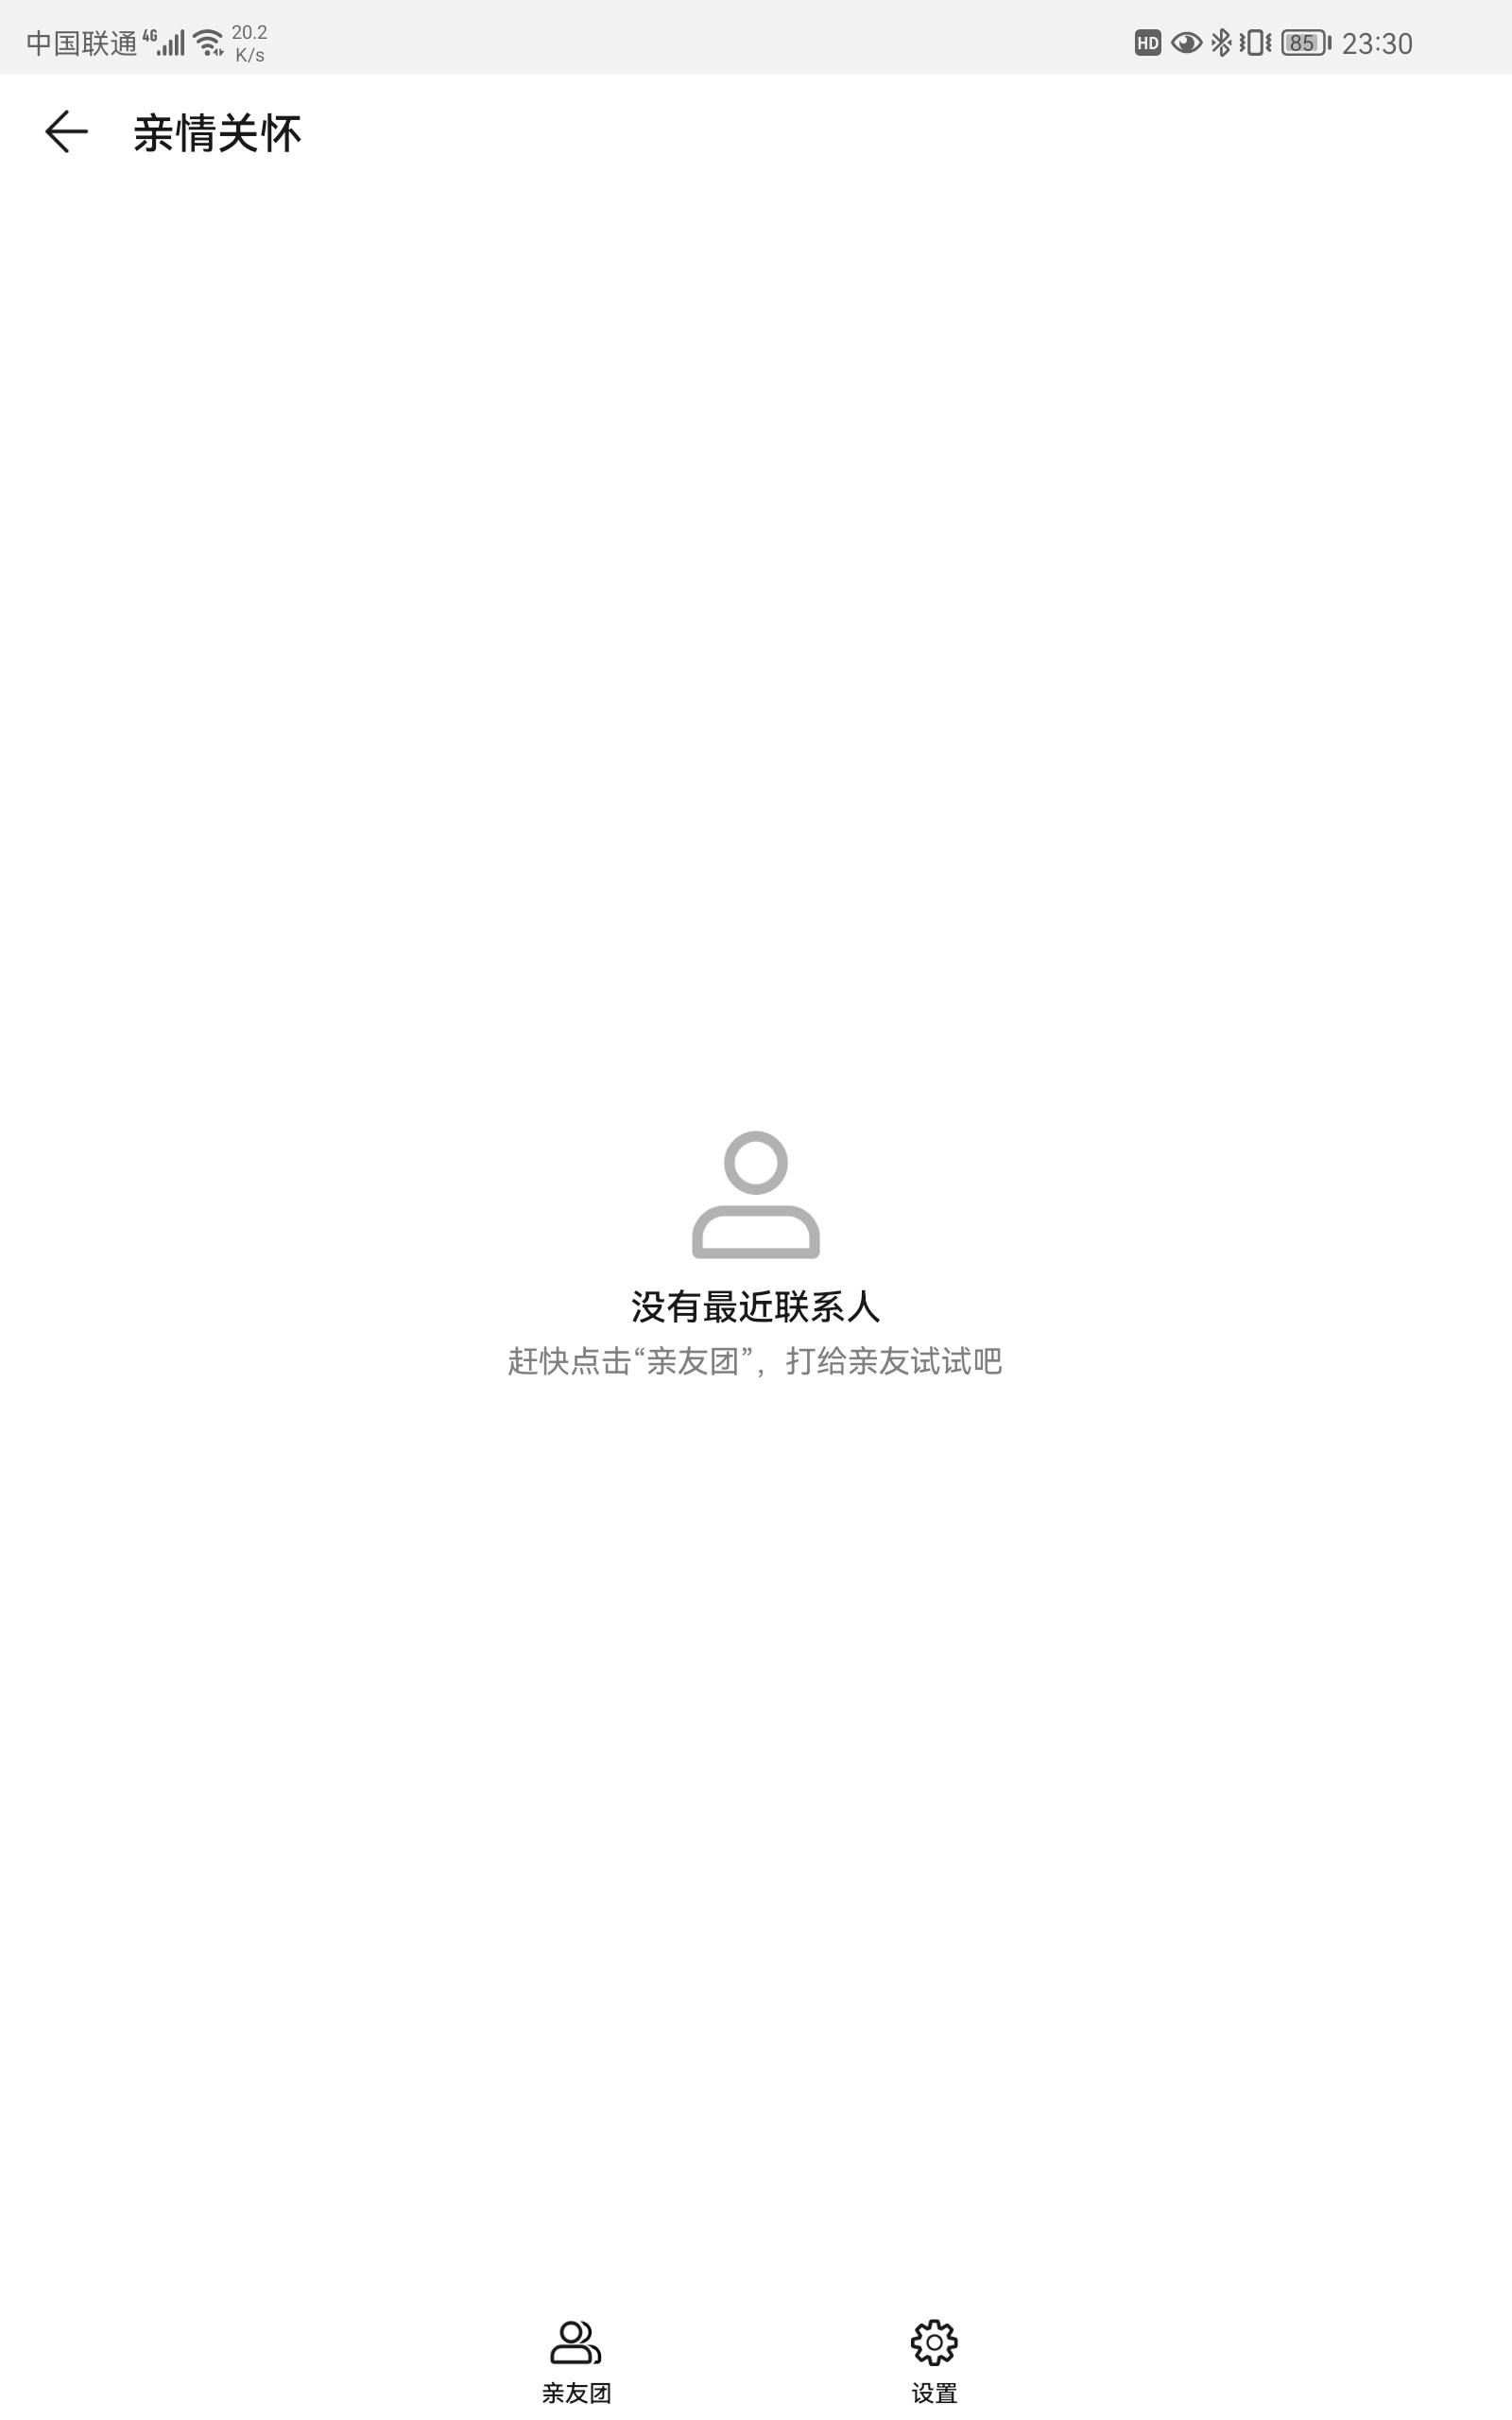 Screenshot_20211014_233052_com.huawei.remoteassistant.jpg